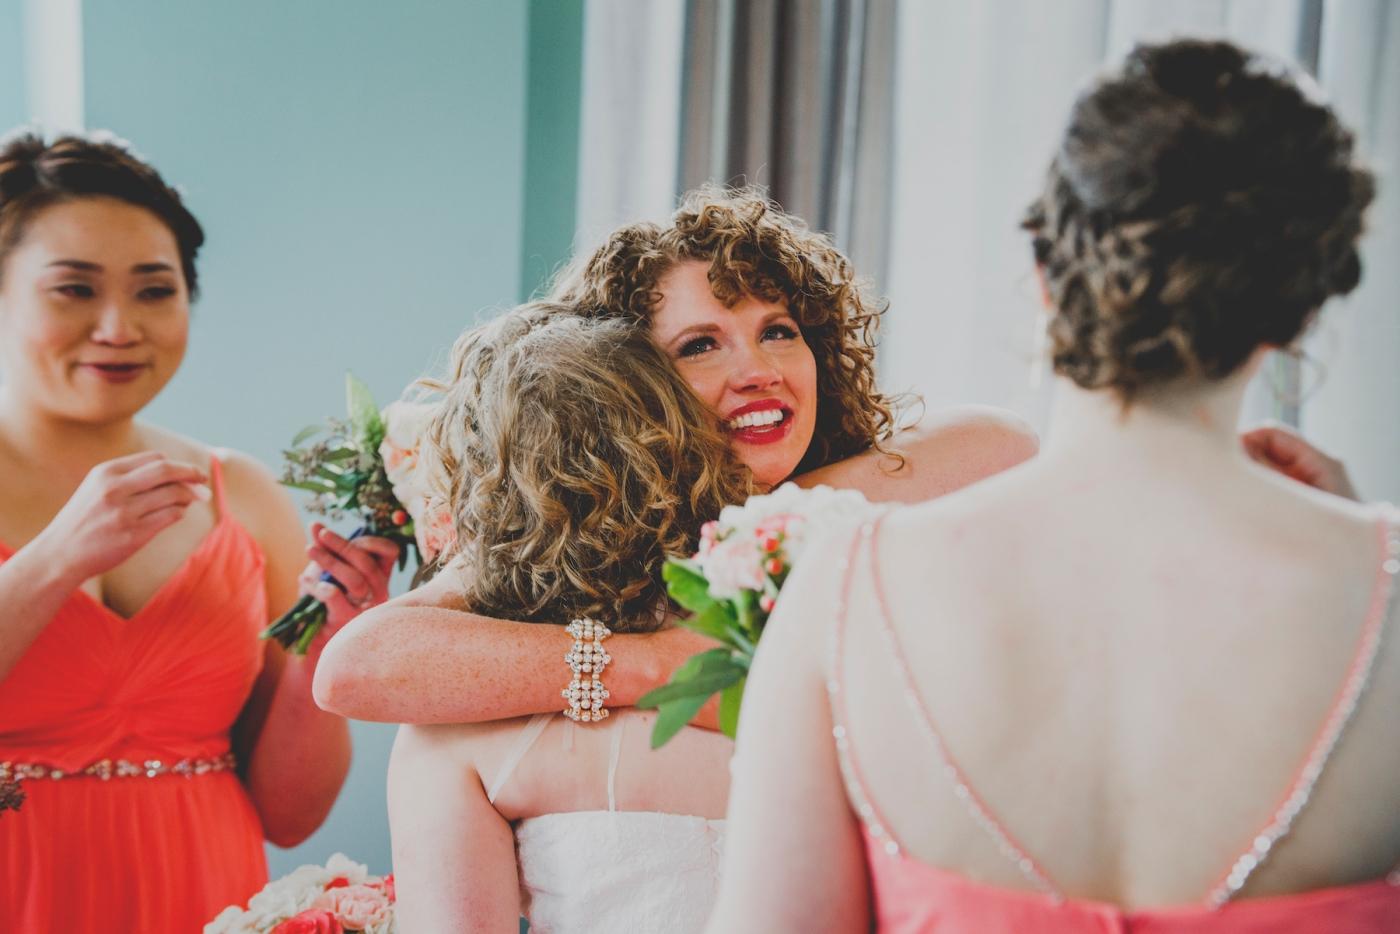 DSC_2483Everett_Wedding_Ballroom_Jane_Speleers_photography_Rachel_and_Edmund_Praying_2017